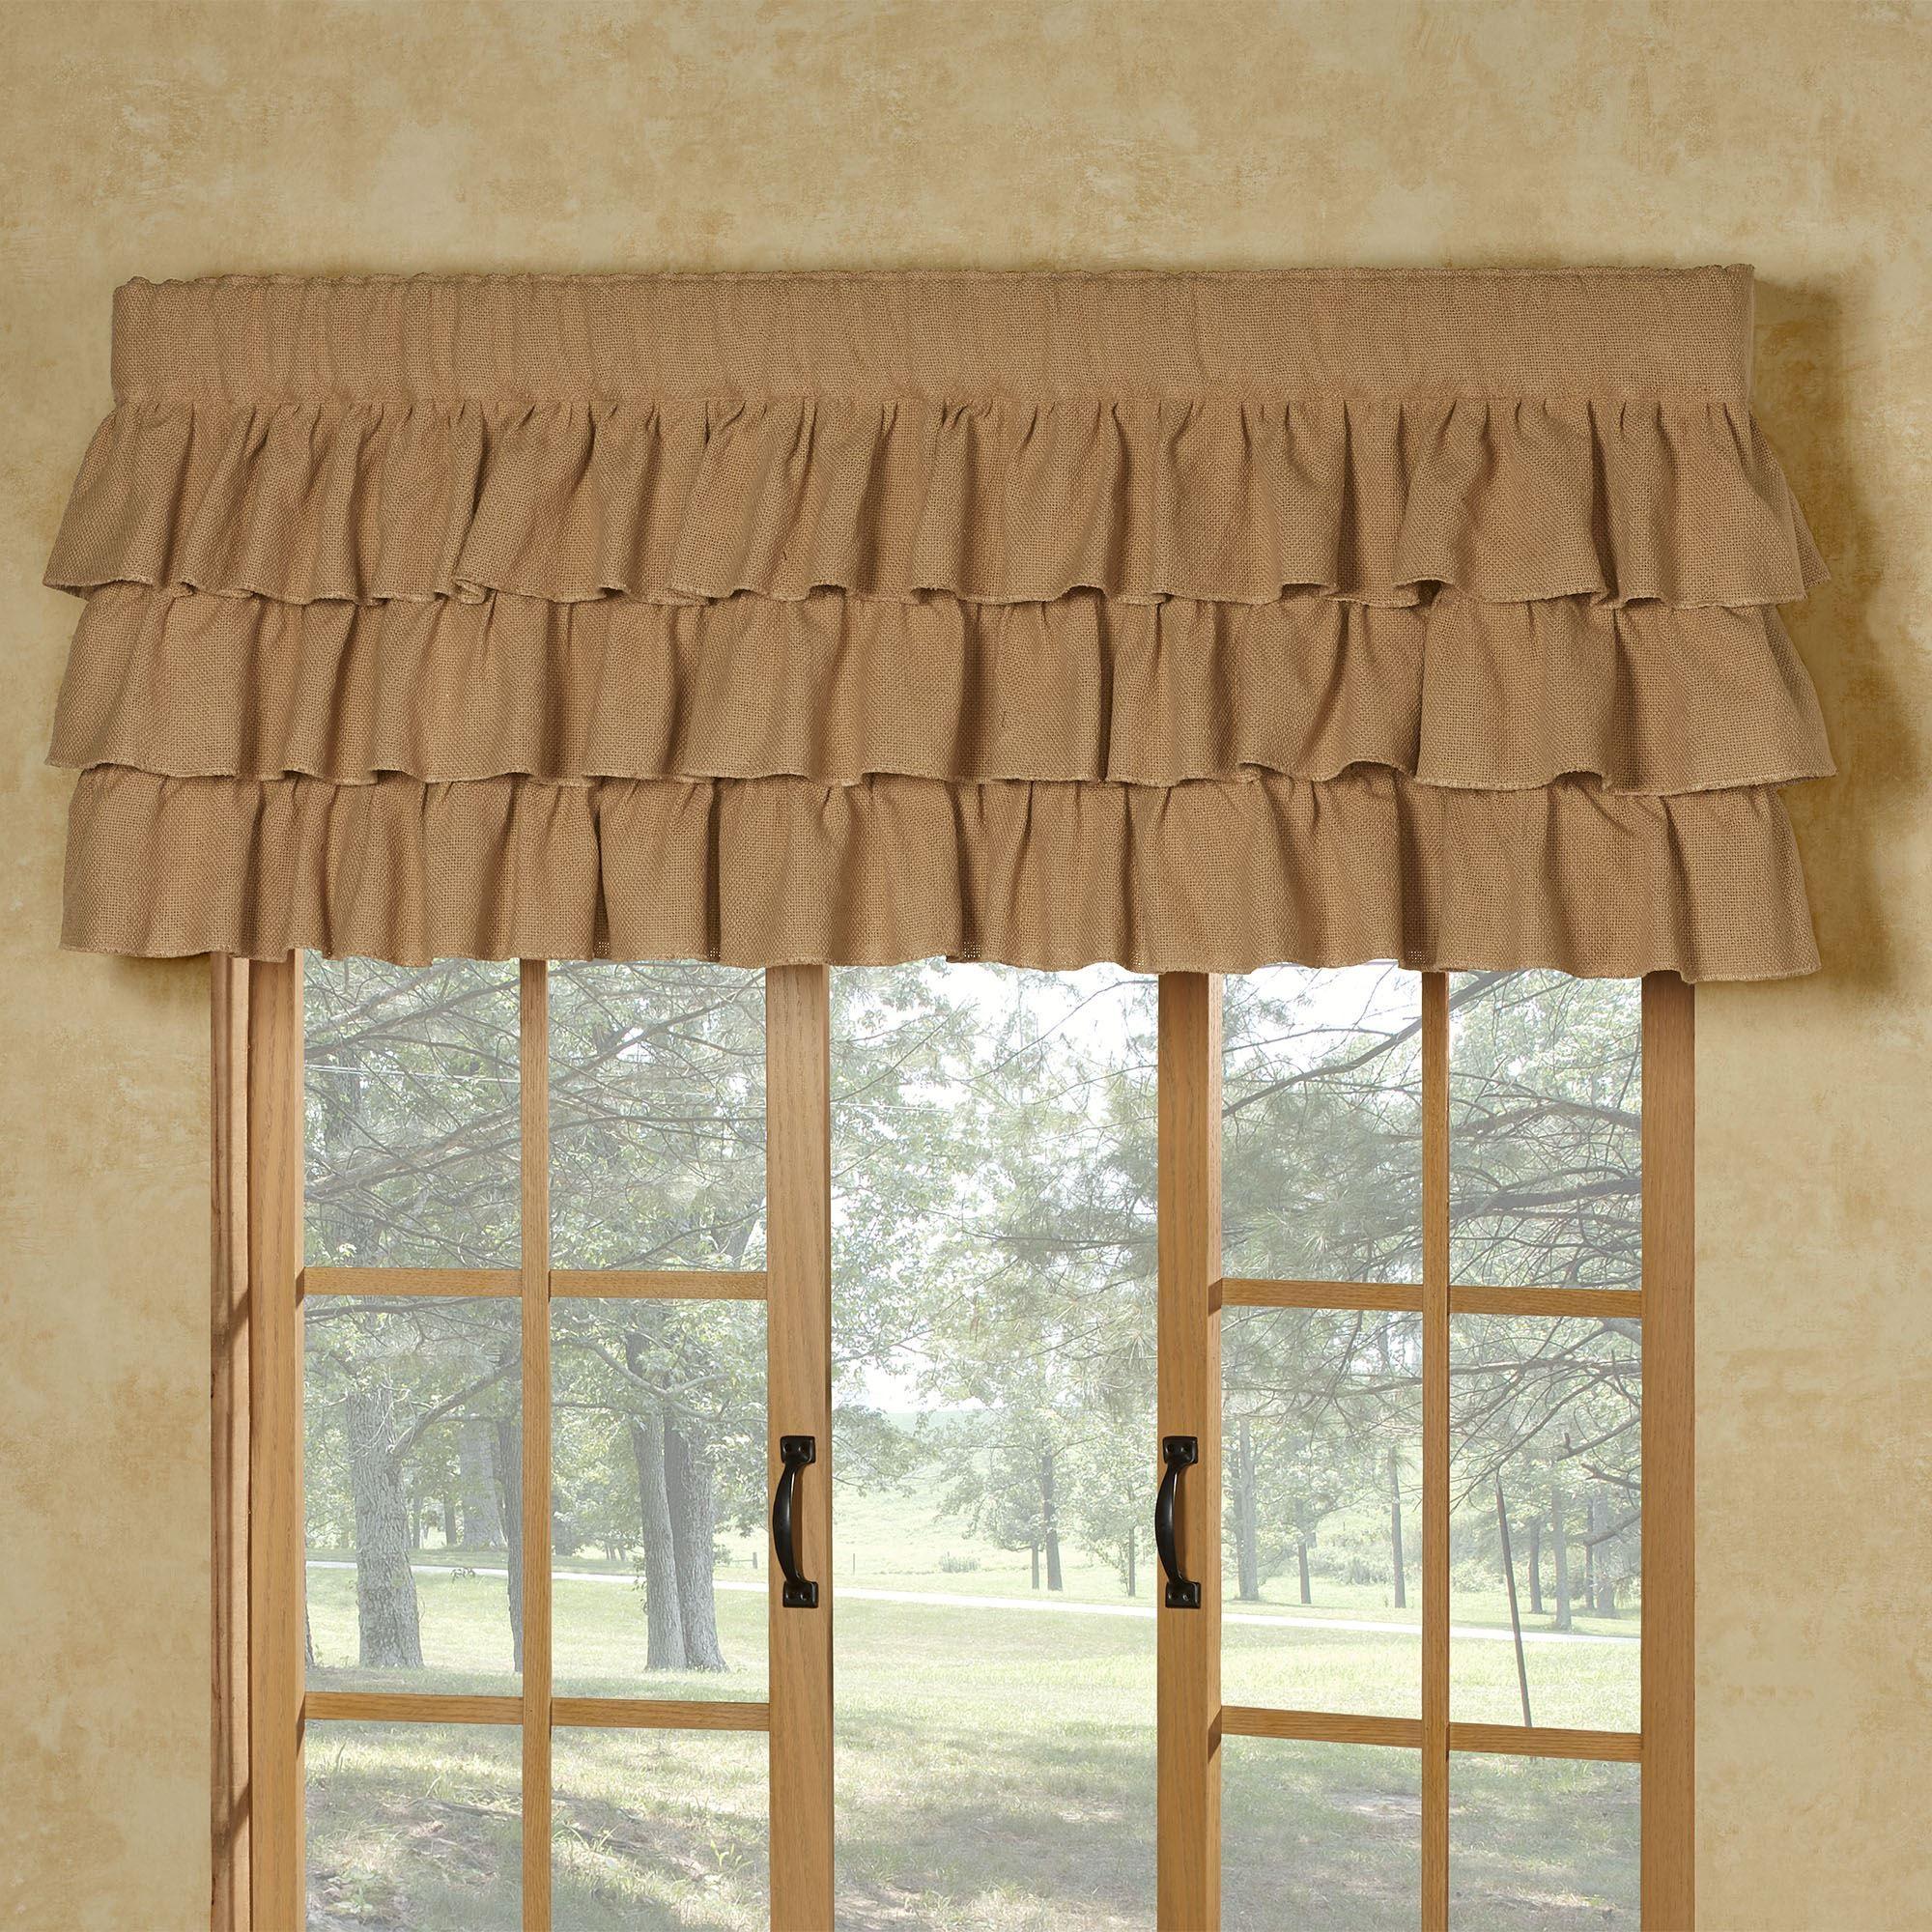 Prairie Mill Farmhouse Style Cotton Burlap Ruffled Window Valance